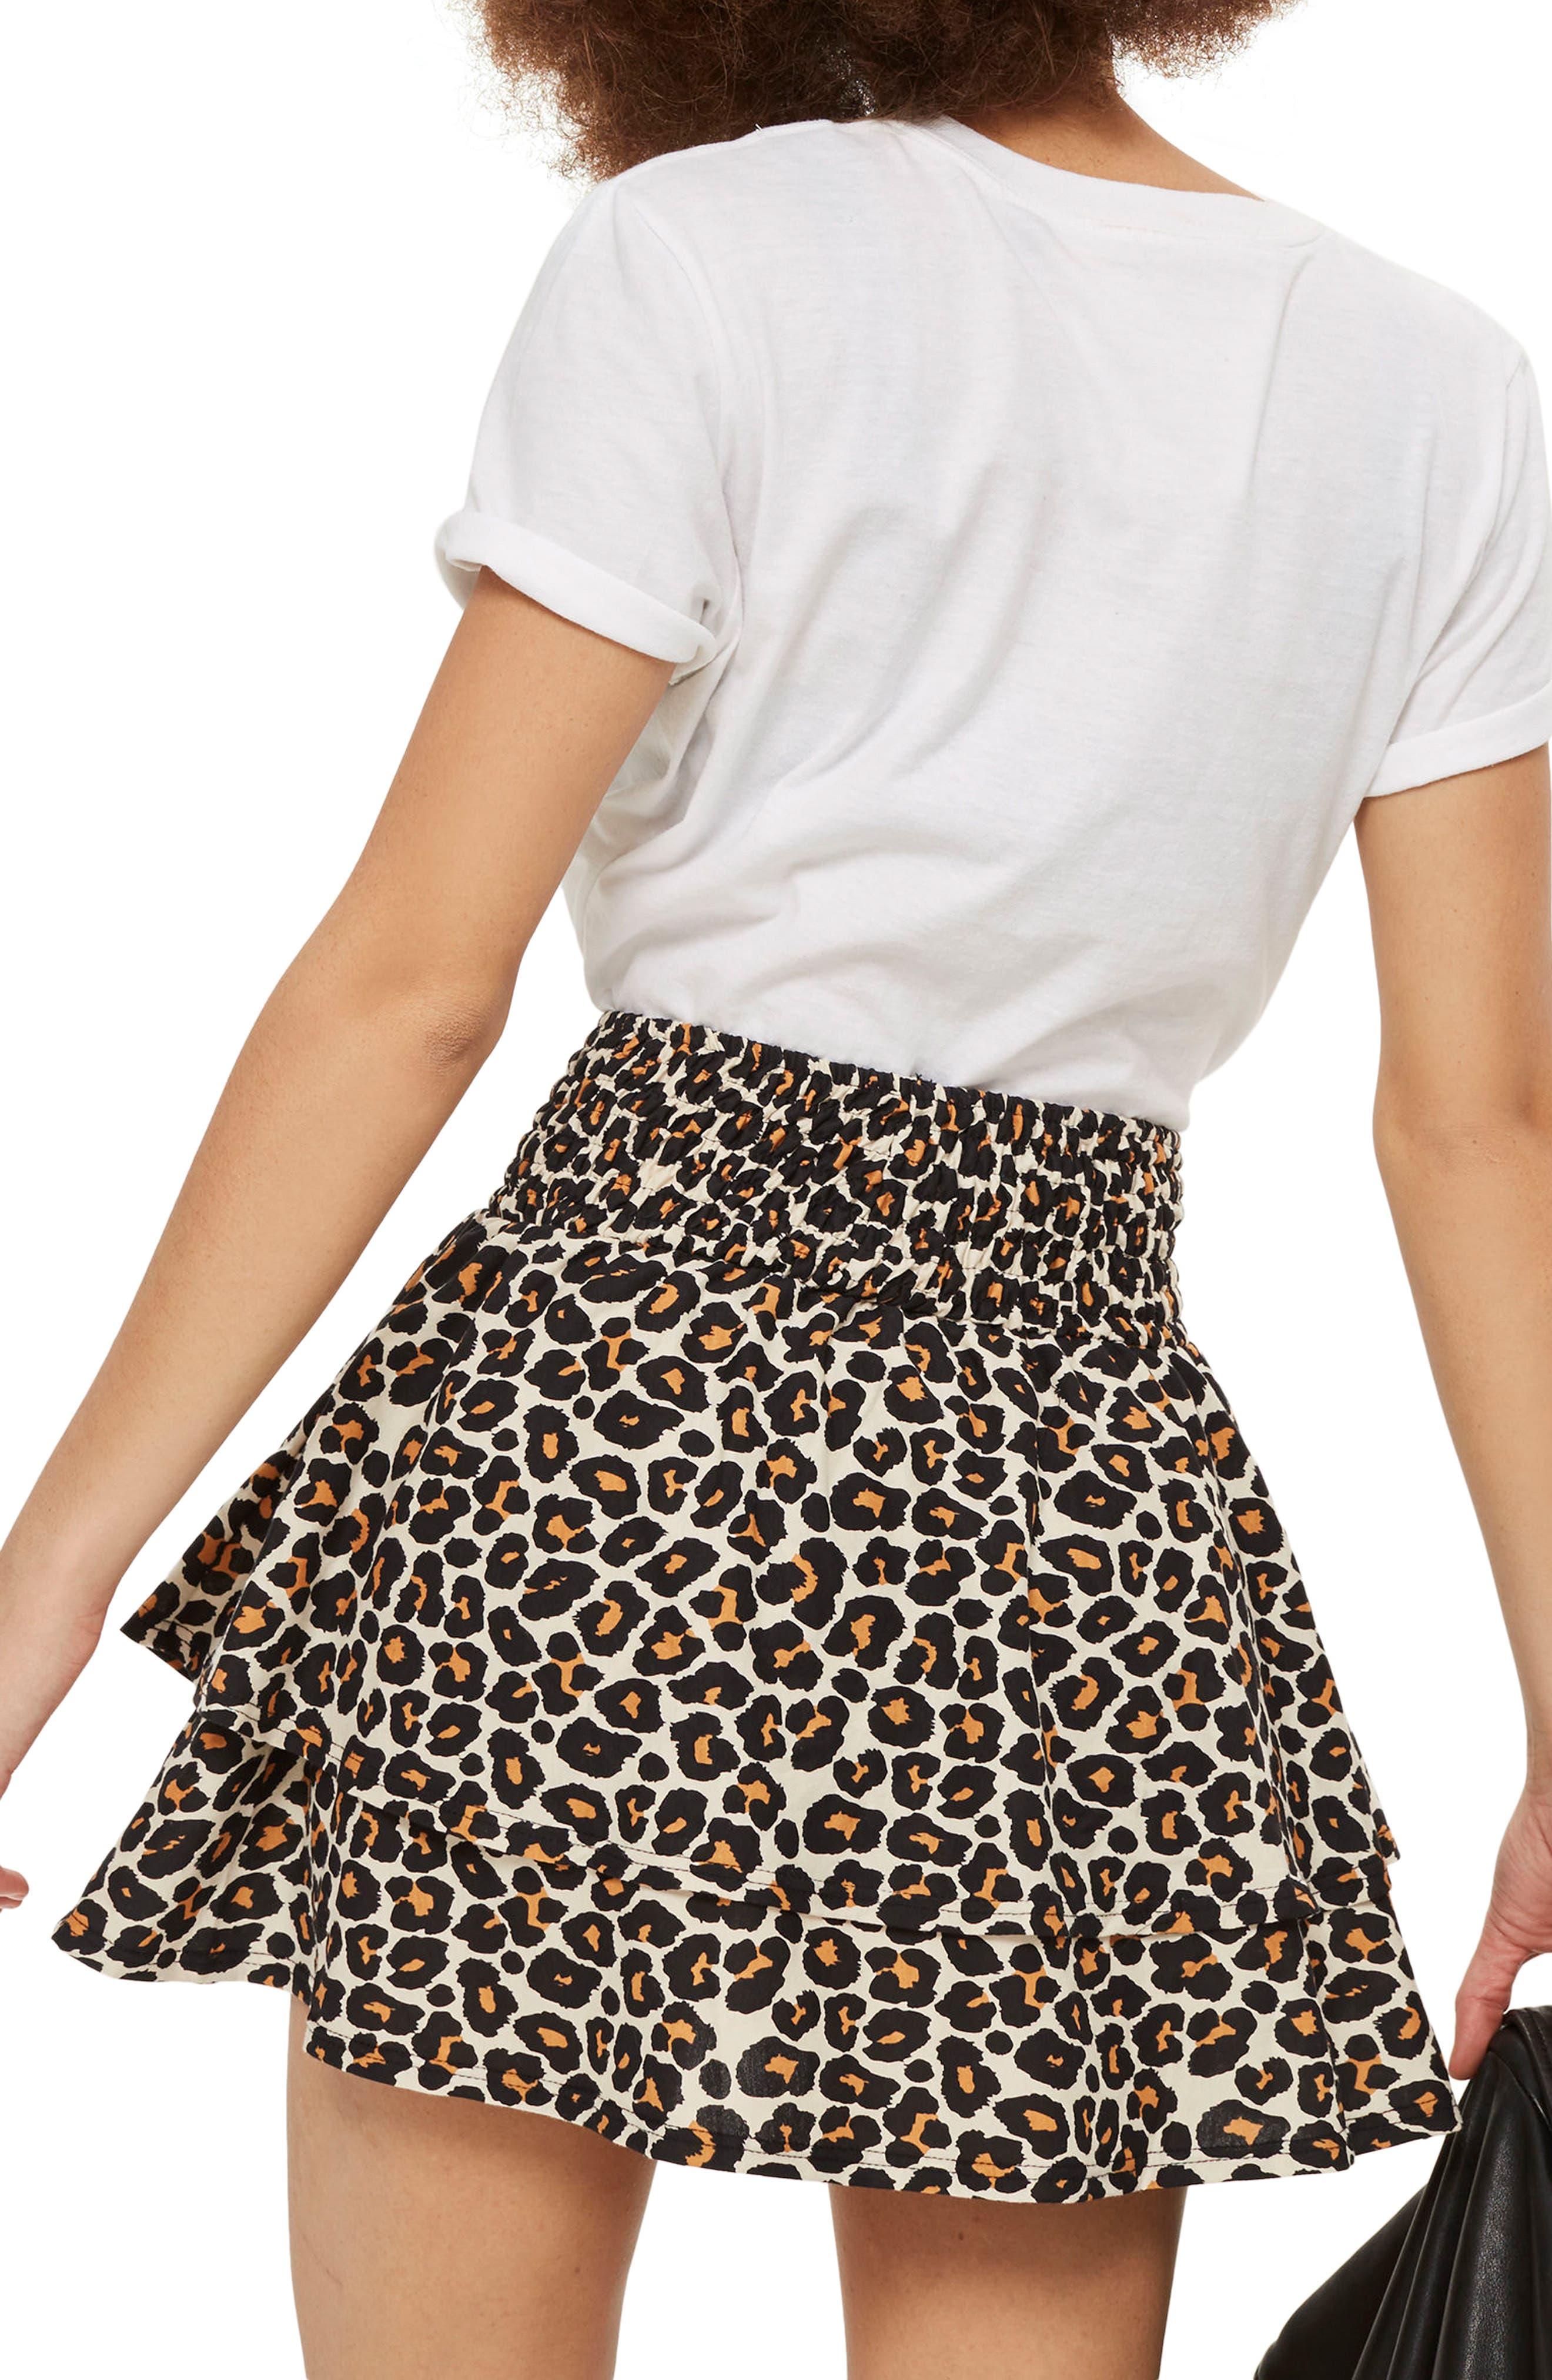 Tiered Leopard Skirt,                             Alternate thumbnail 2, color,                             Leopard